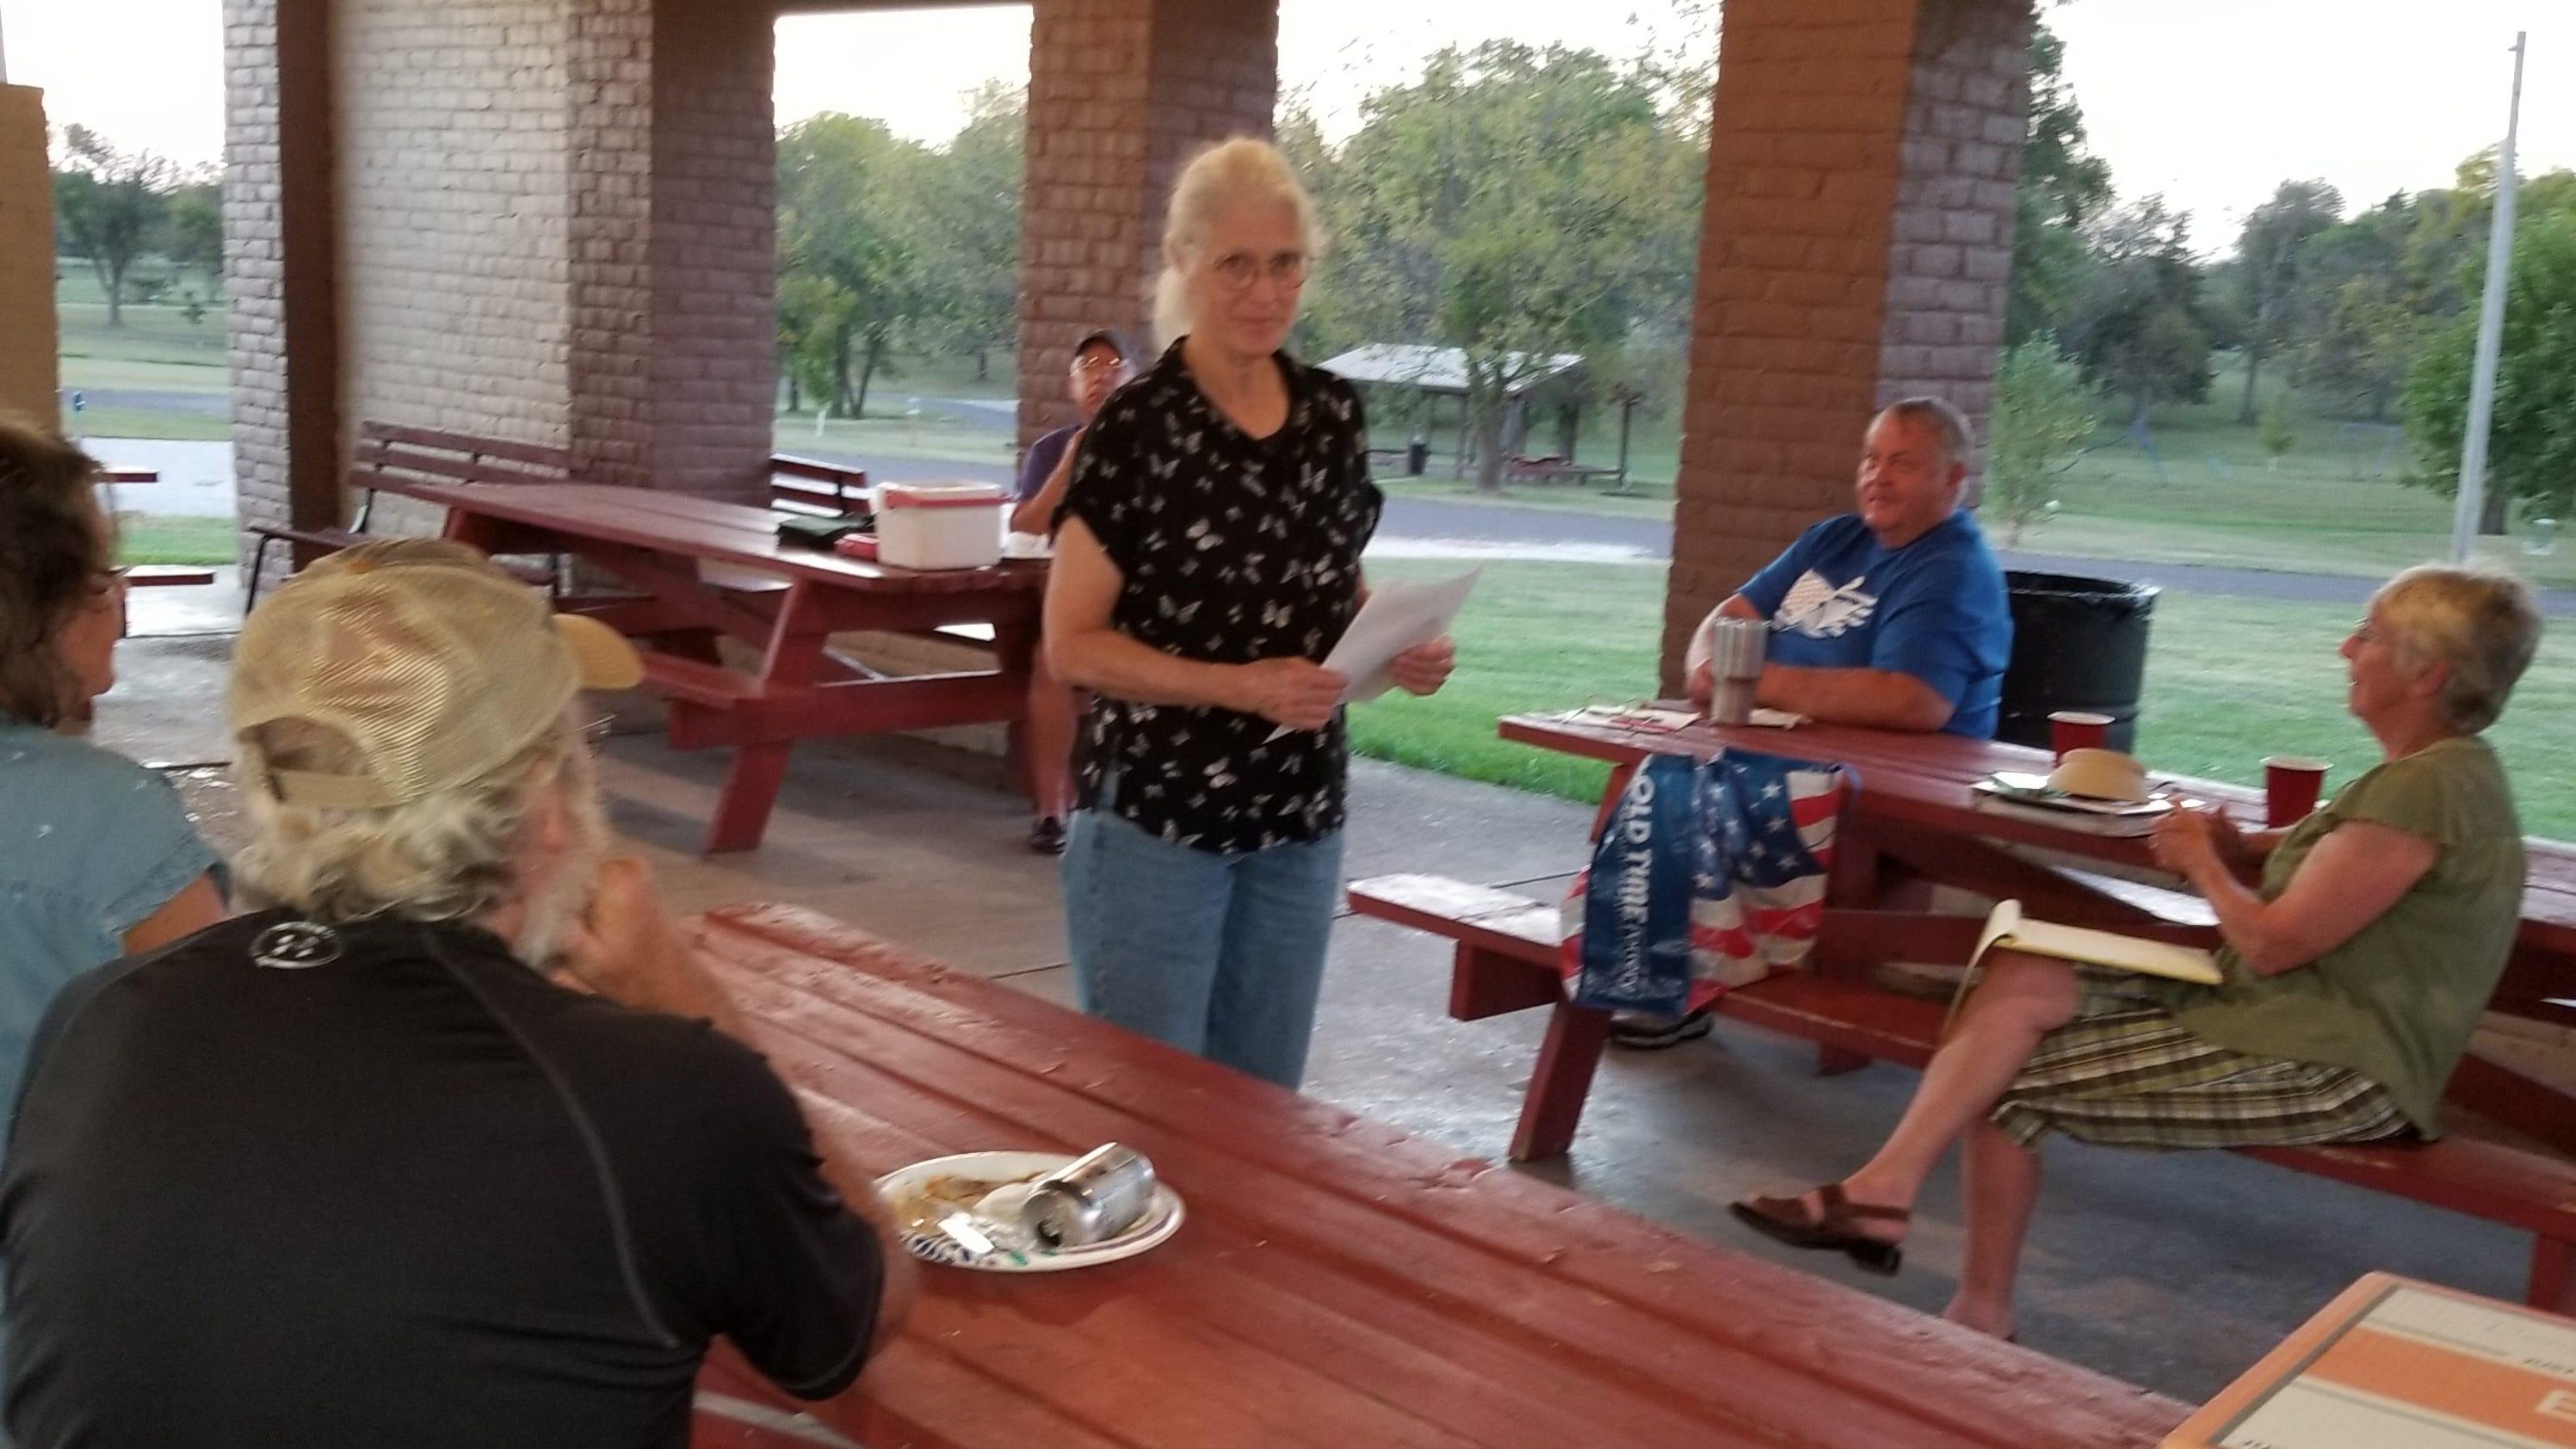 Climate change activist addresses Linn County Democrats - Linn County Leader